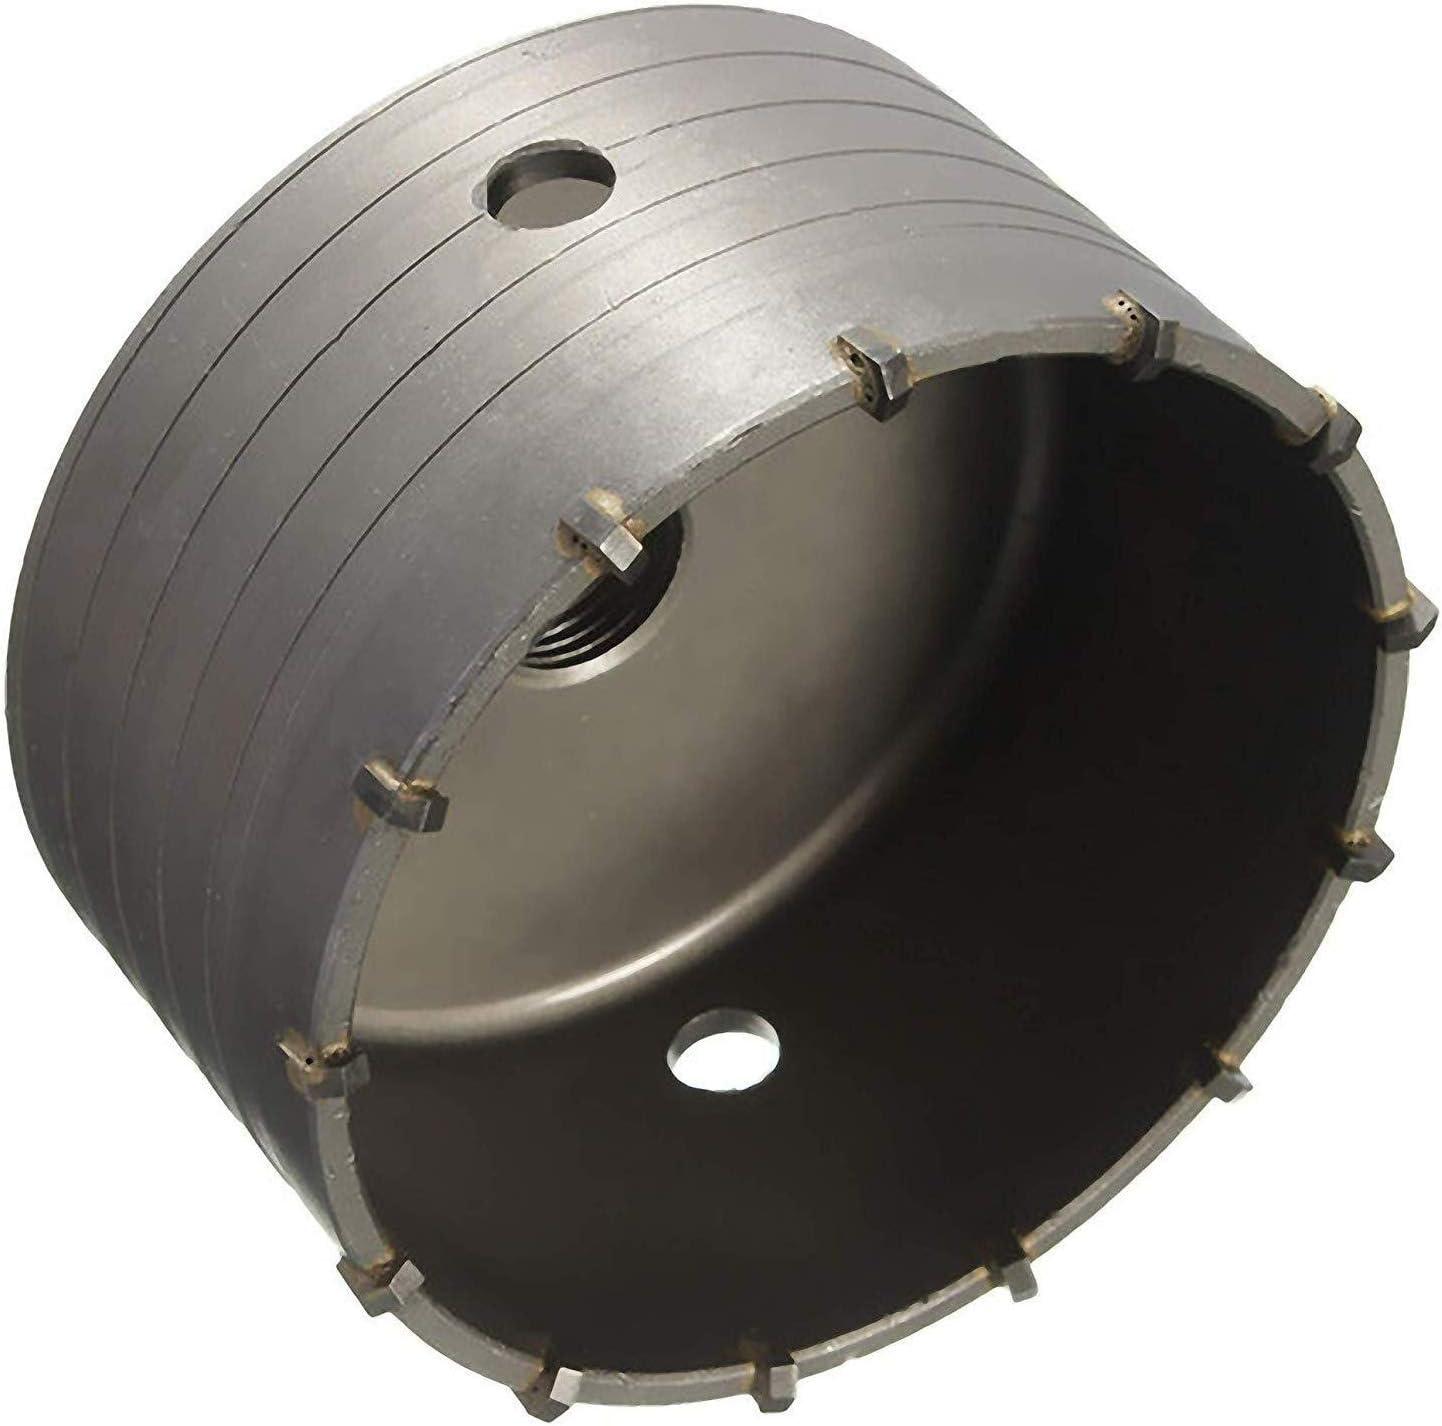 Bohrkrone Dosenbohrer SDS Max 160 mm Durchmesser komplett f/ür Bohrhammer SDS MAX 600 mm